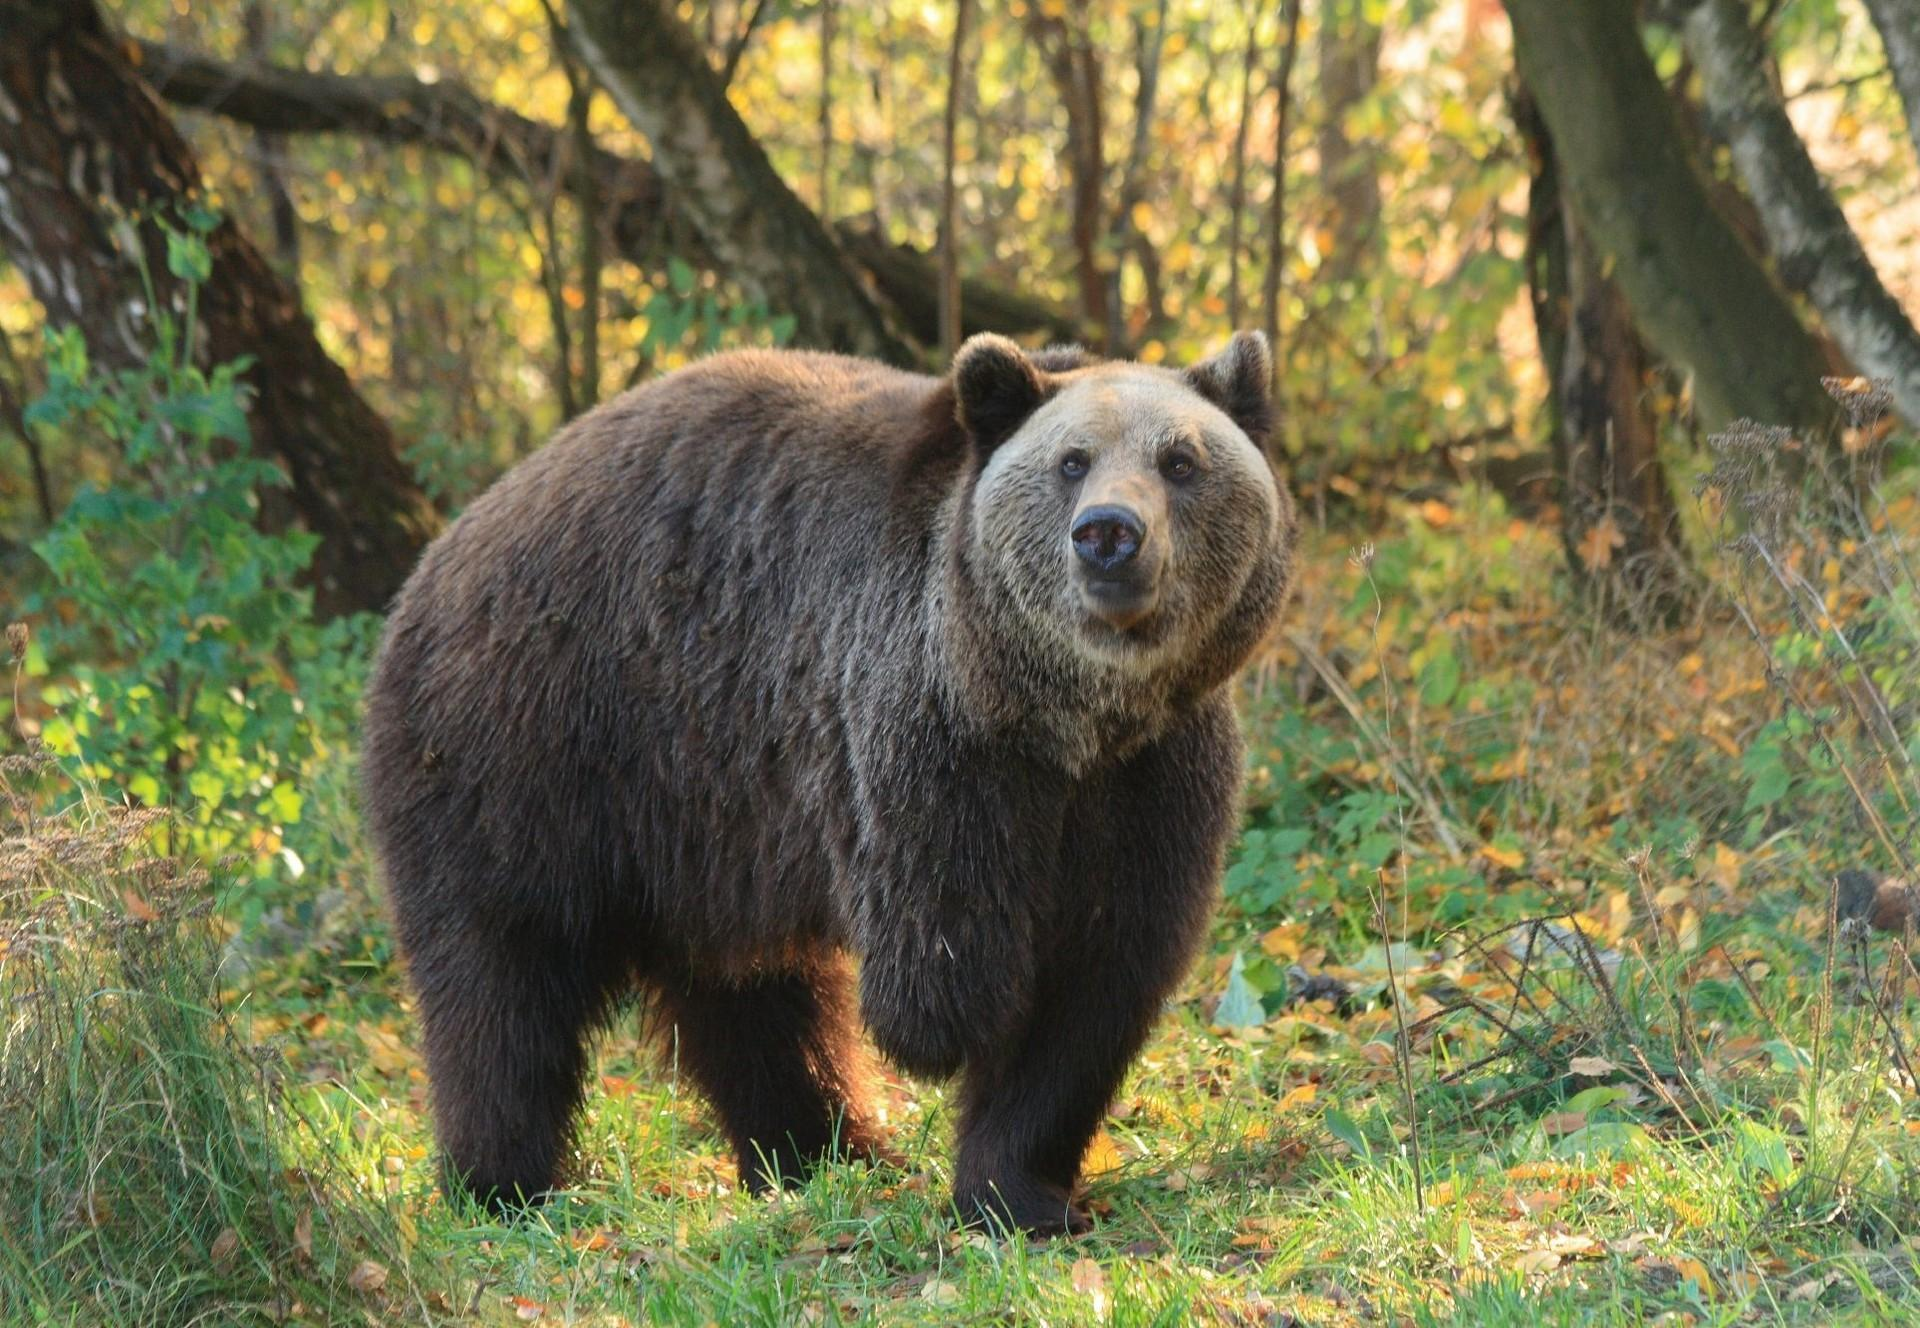 BEAR SANCTUARY Müritz